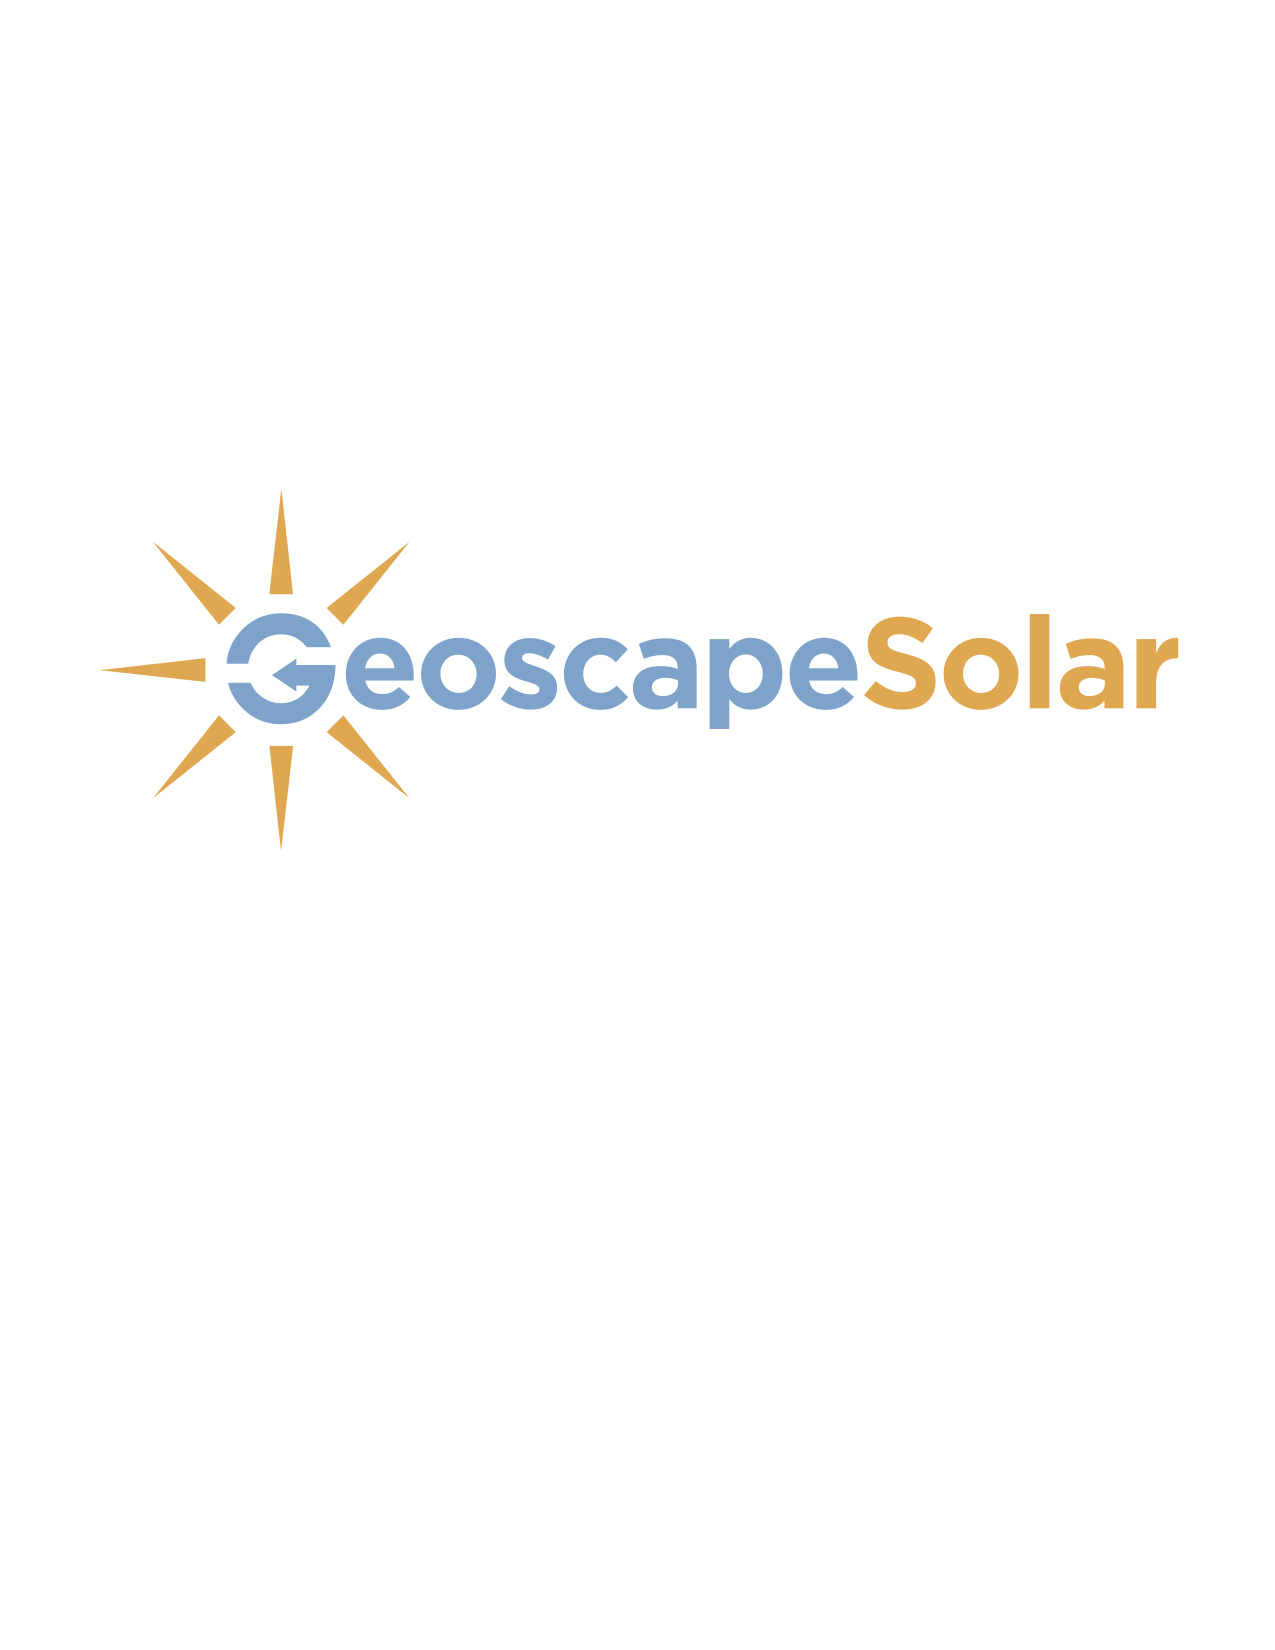 Vivint solar reviews california - Geoscape Solar